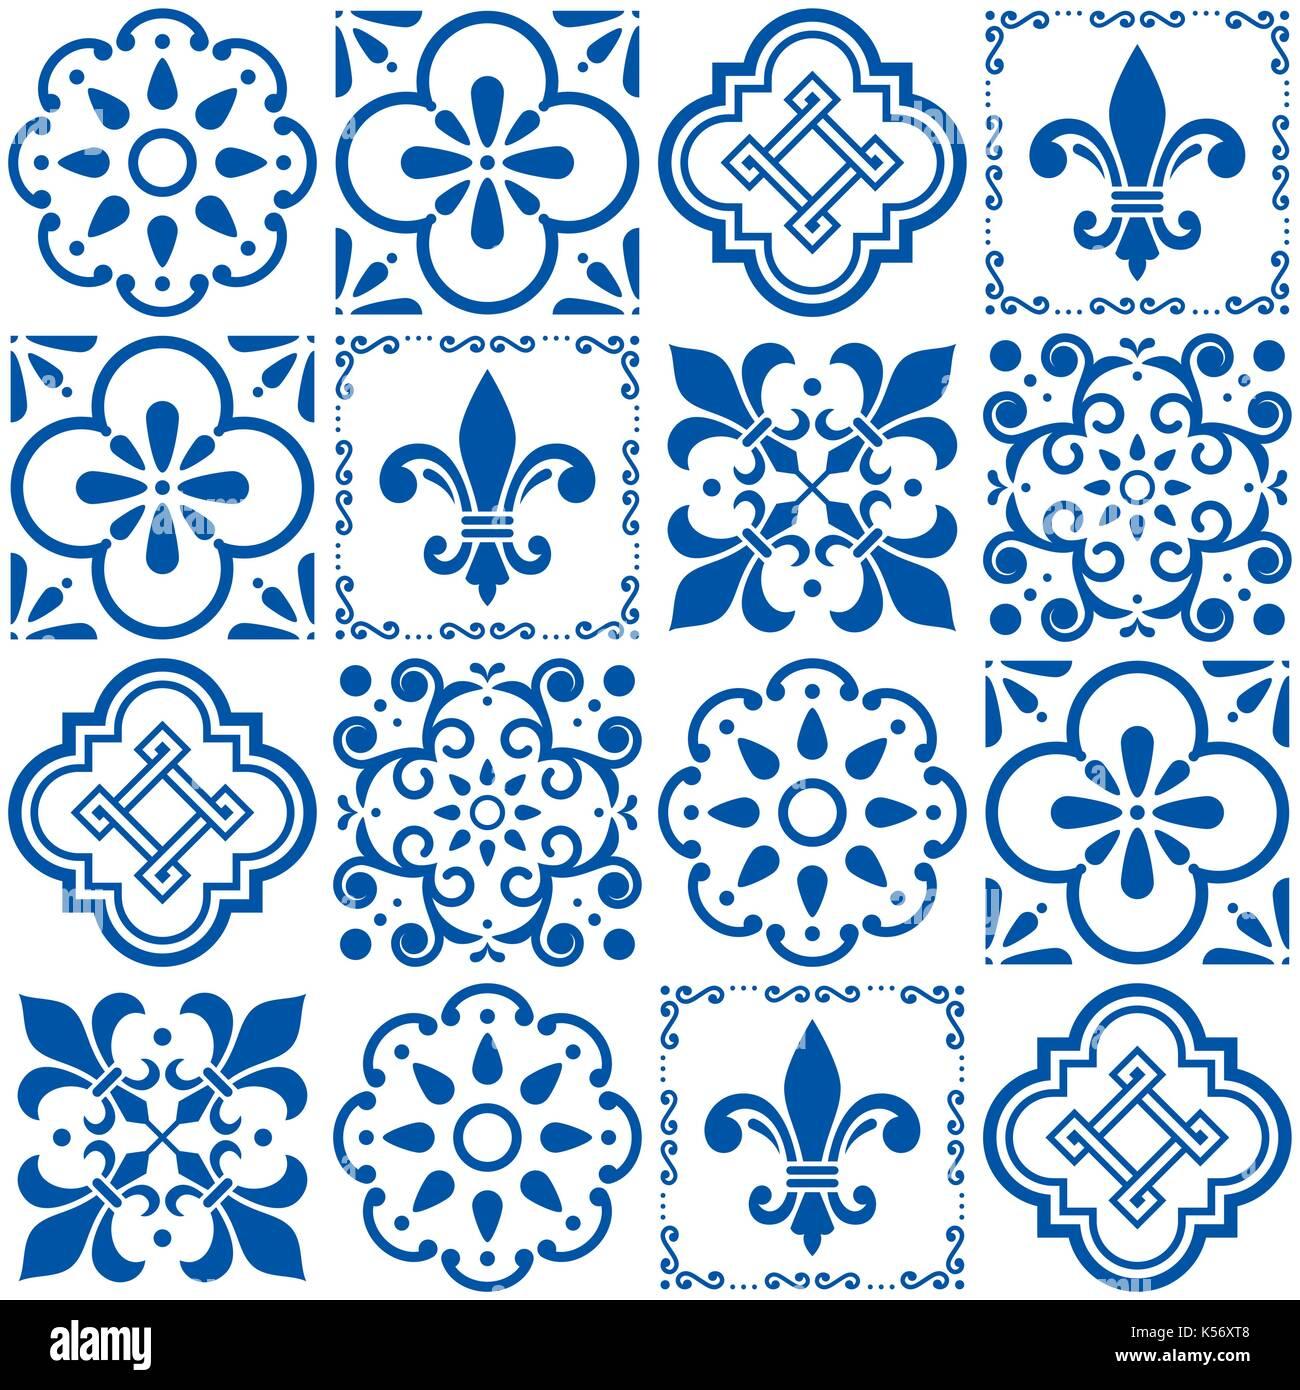 Portuguese vector tiles pattern, Lisbon seamless indigo blue tile design, Azulejos vintage geometric ceramics   Floral and abstract shapes texture - Stock Vector